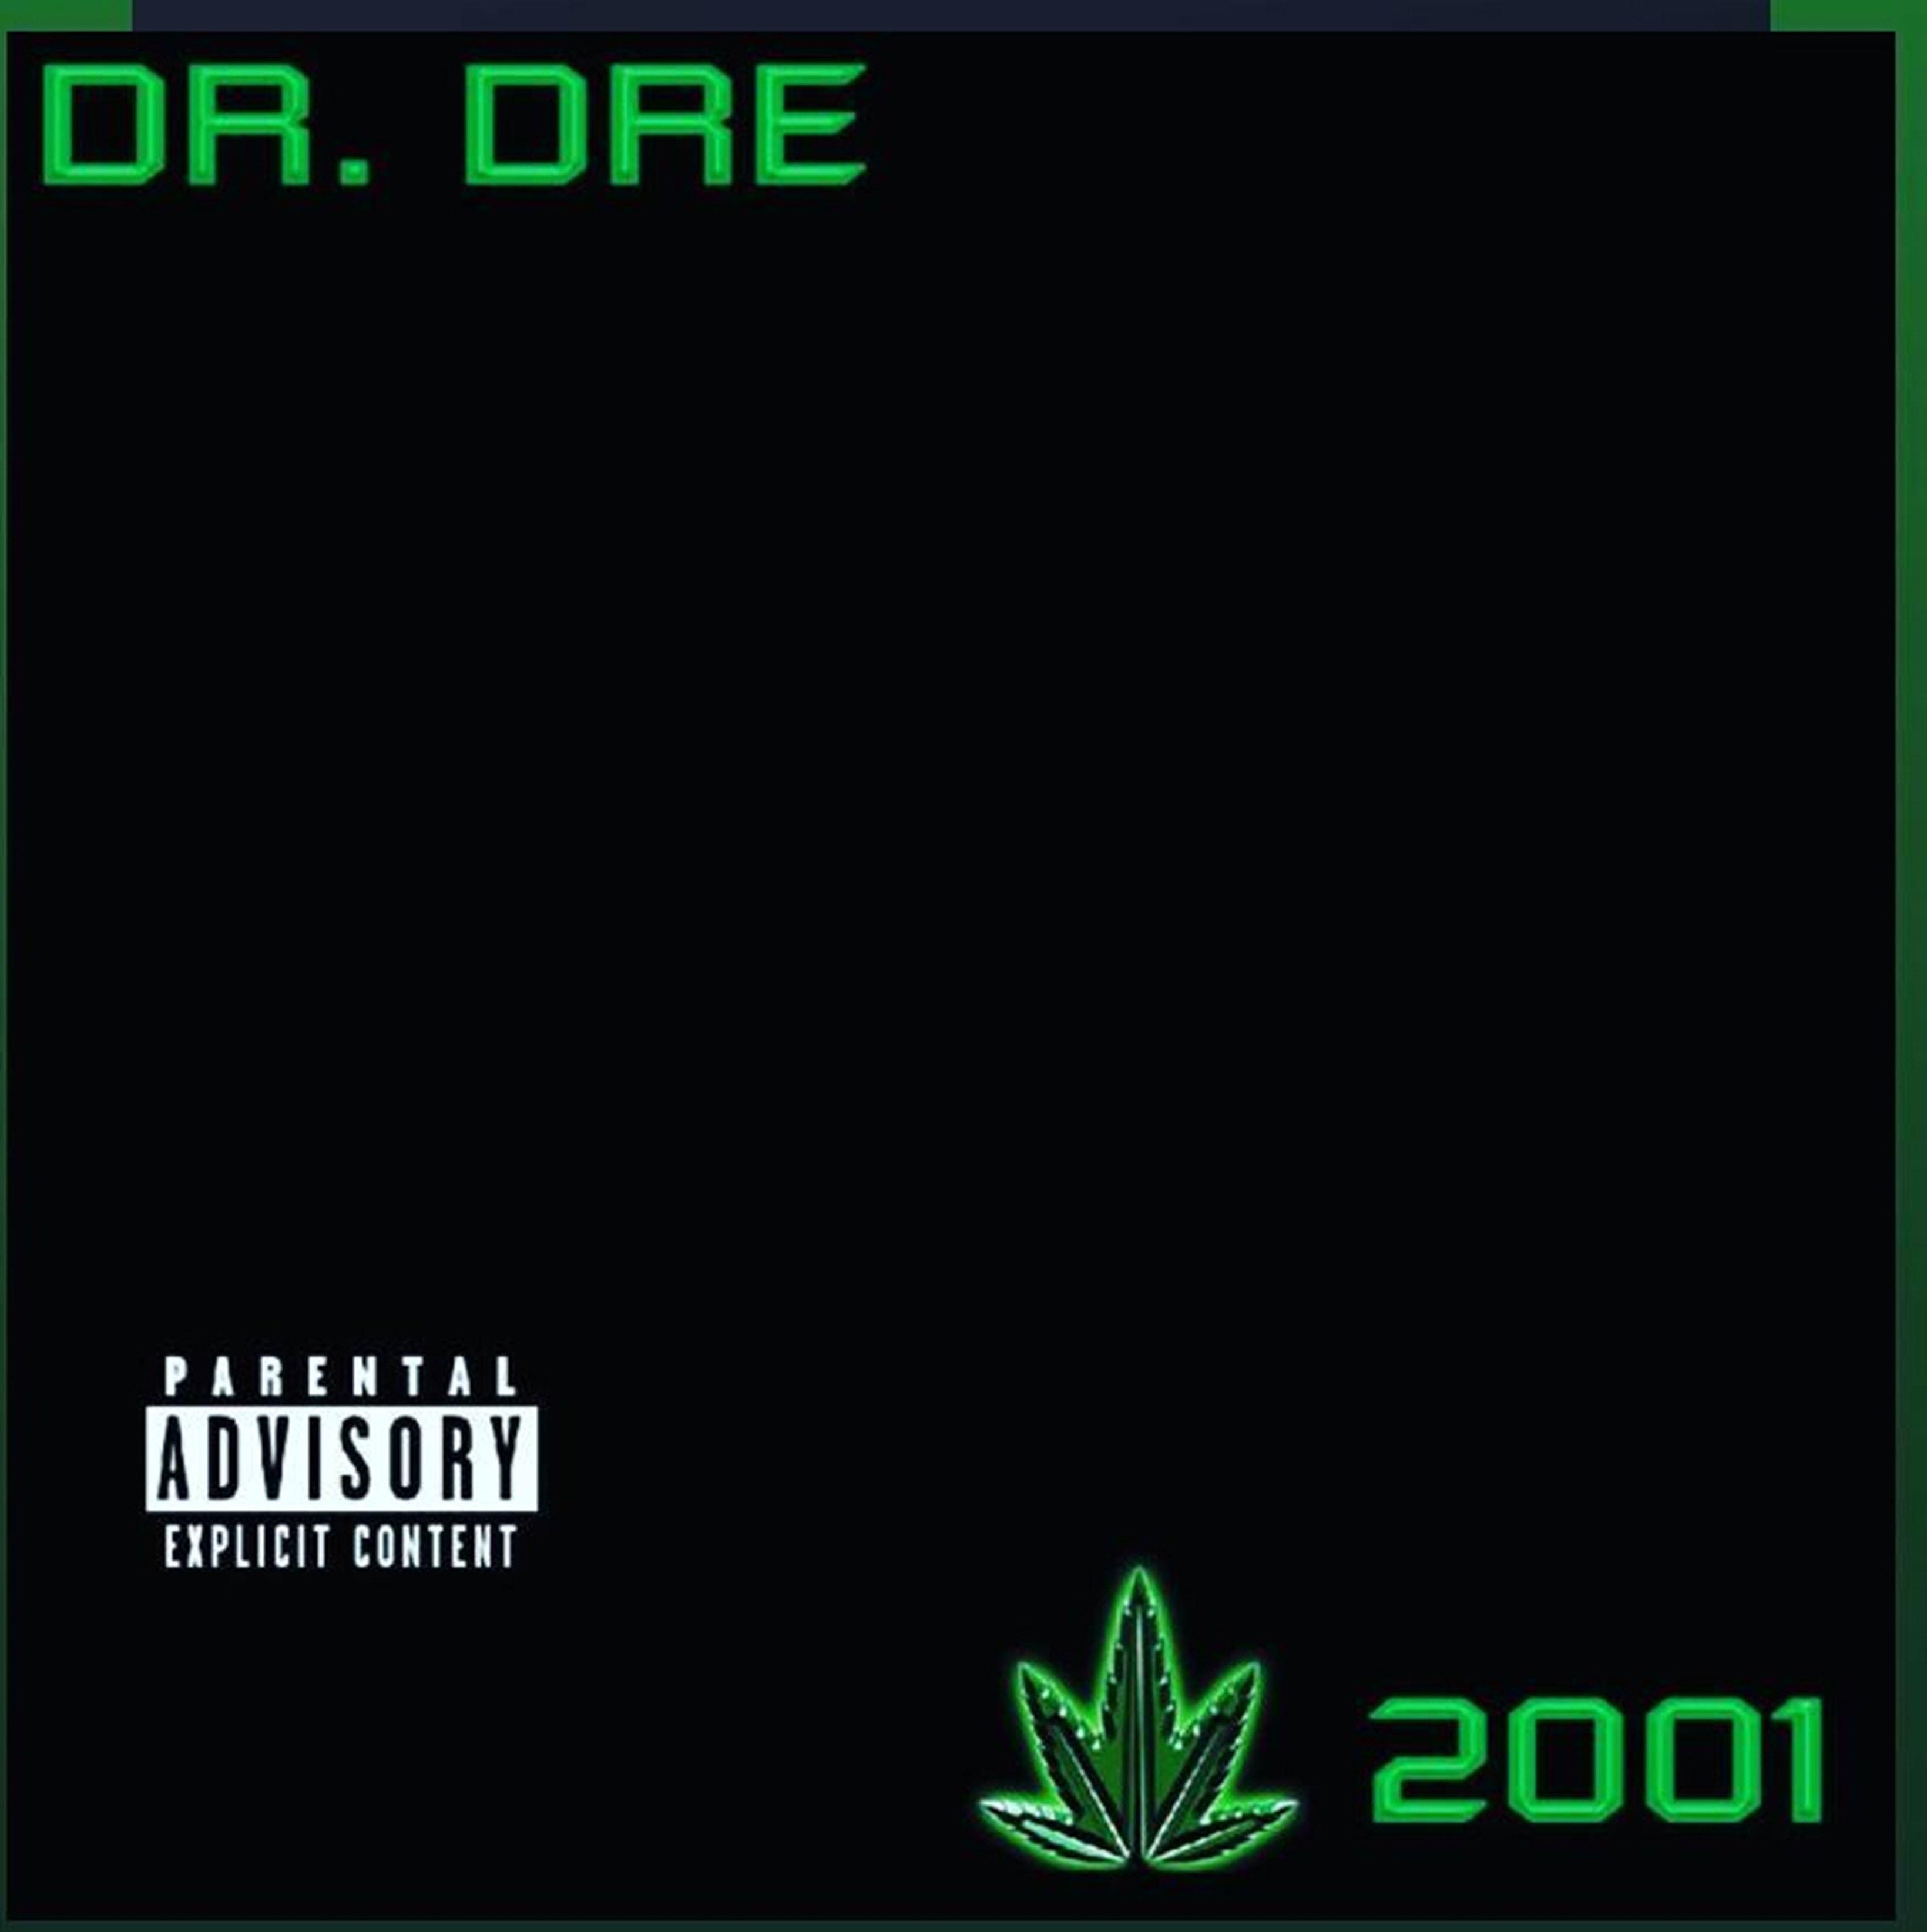 2001 - 1